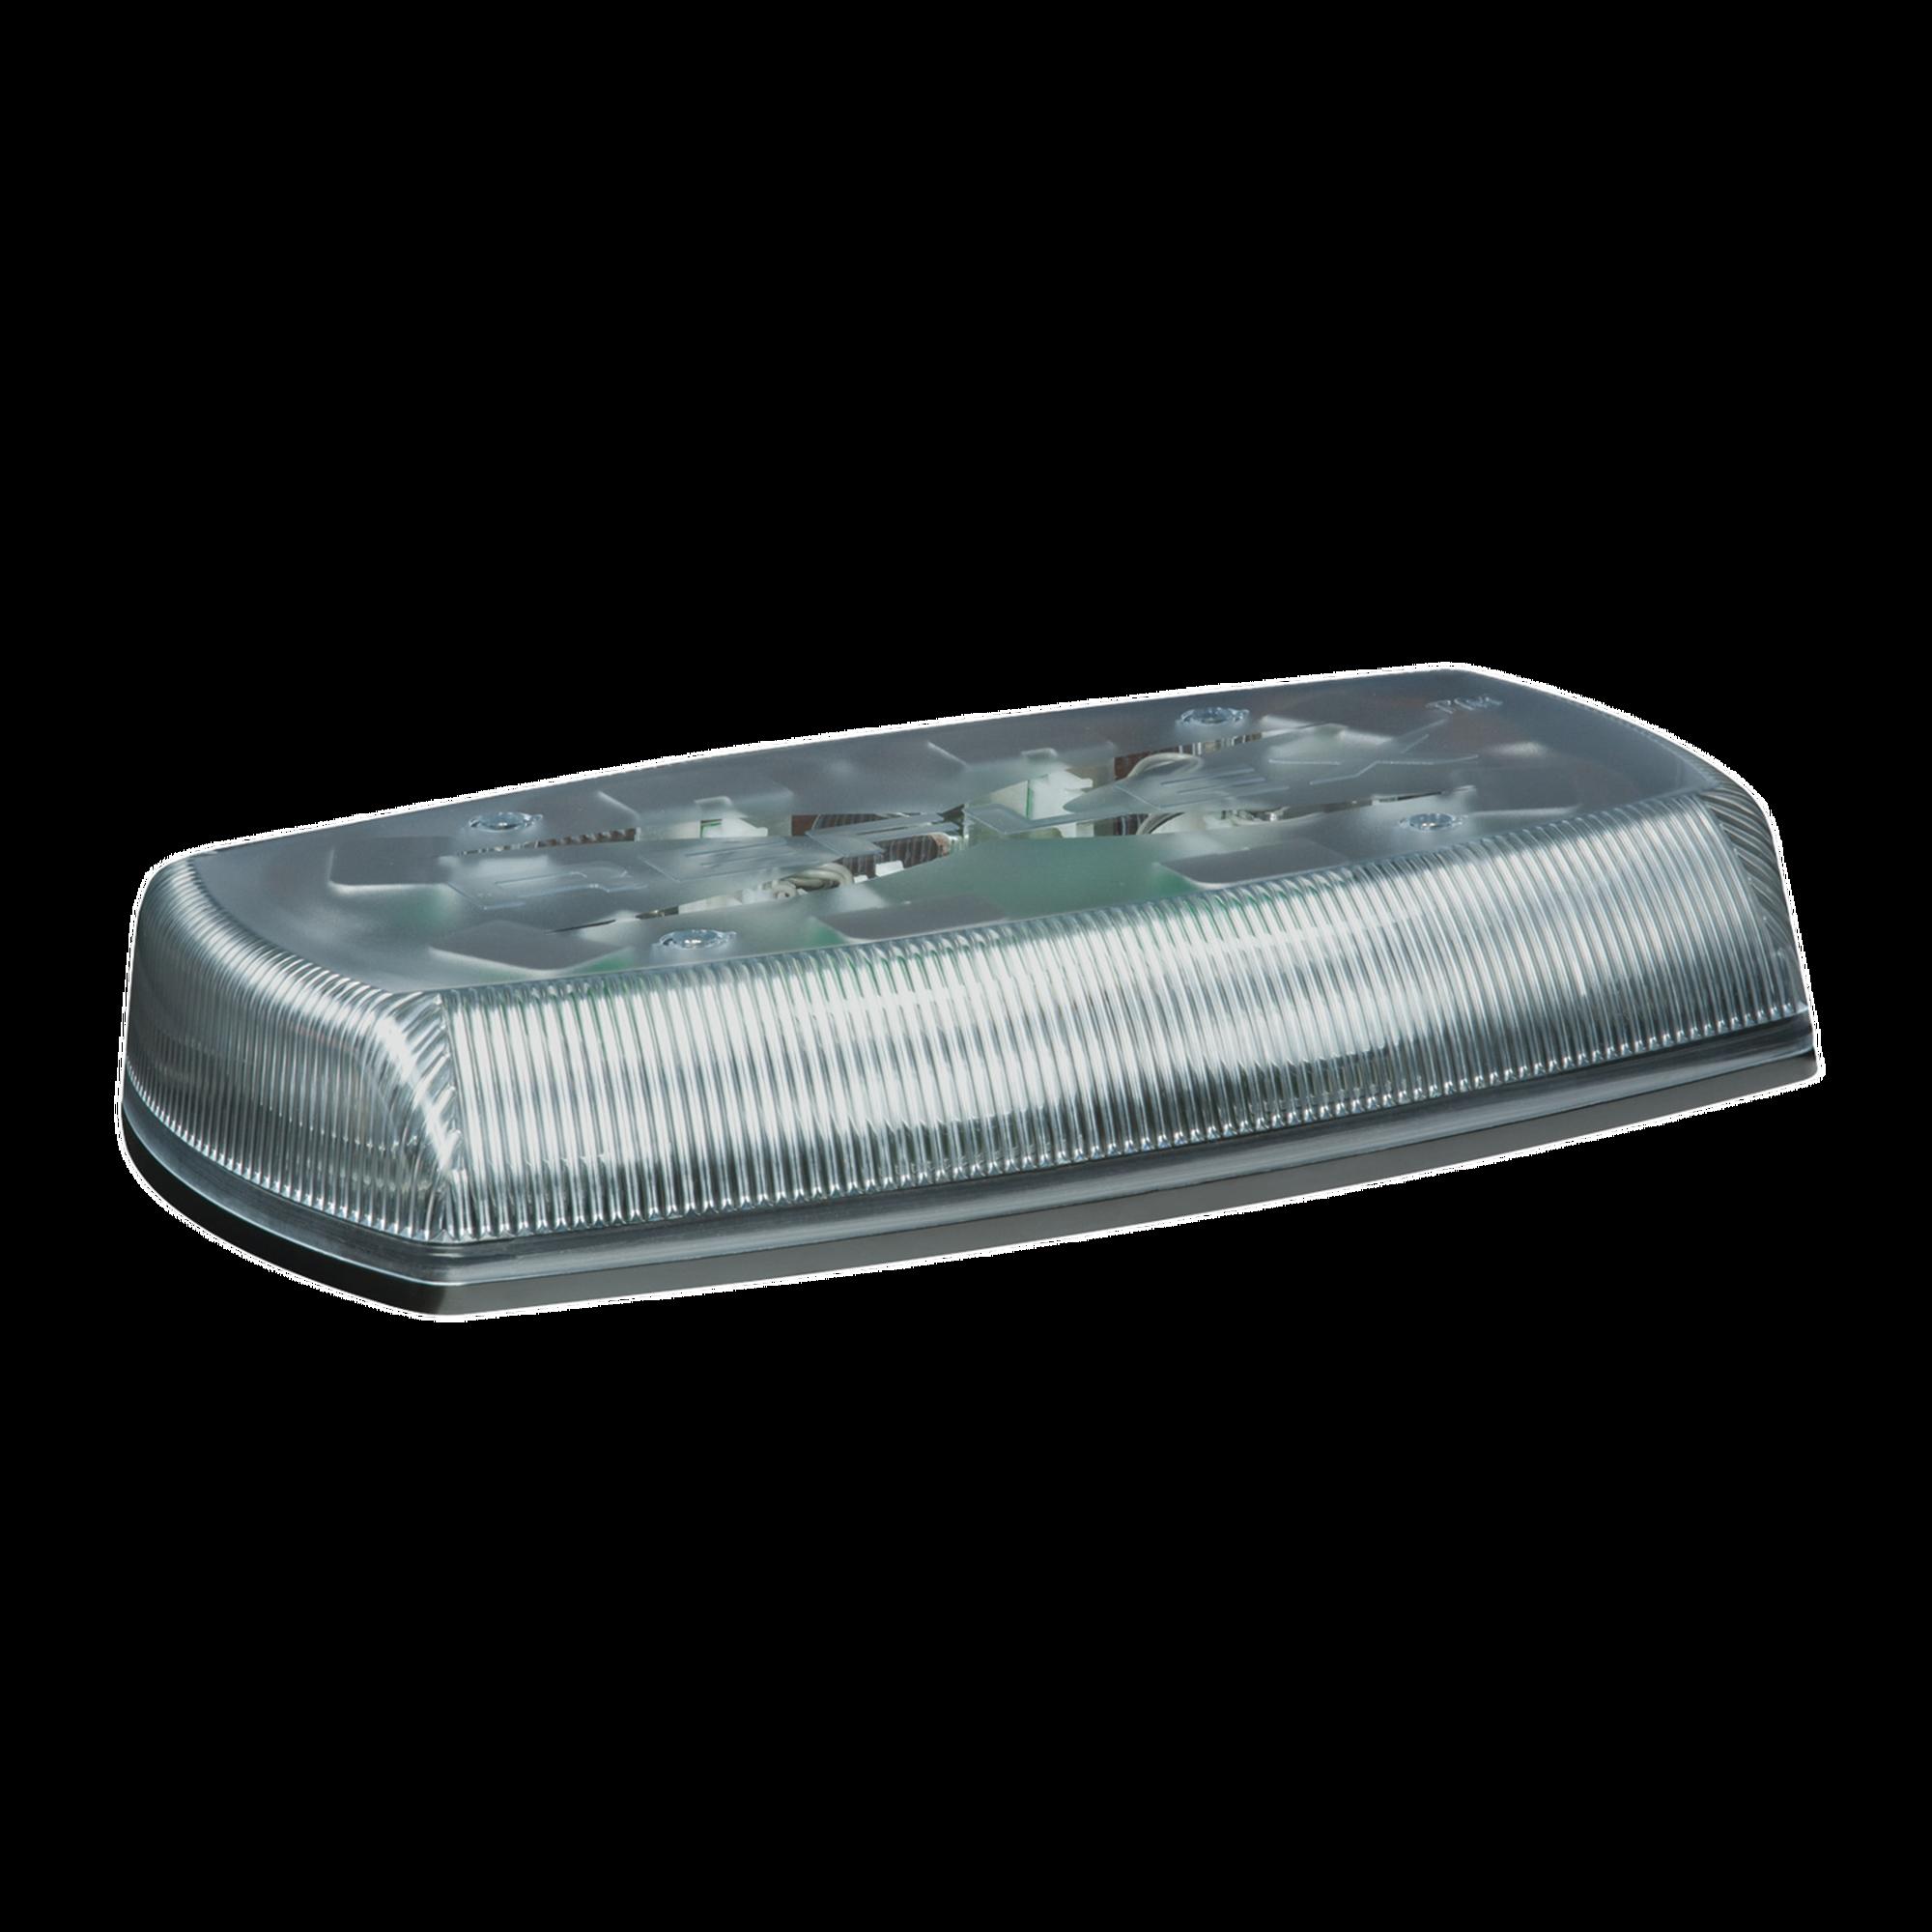 Mini Barra de Luces Ultra Brillante, color domo claro, LED ambar, Ideal para Seguridad Privada